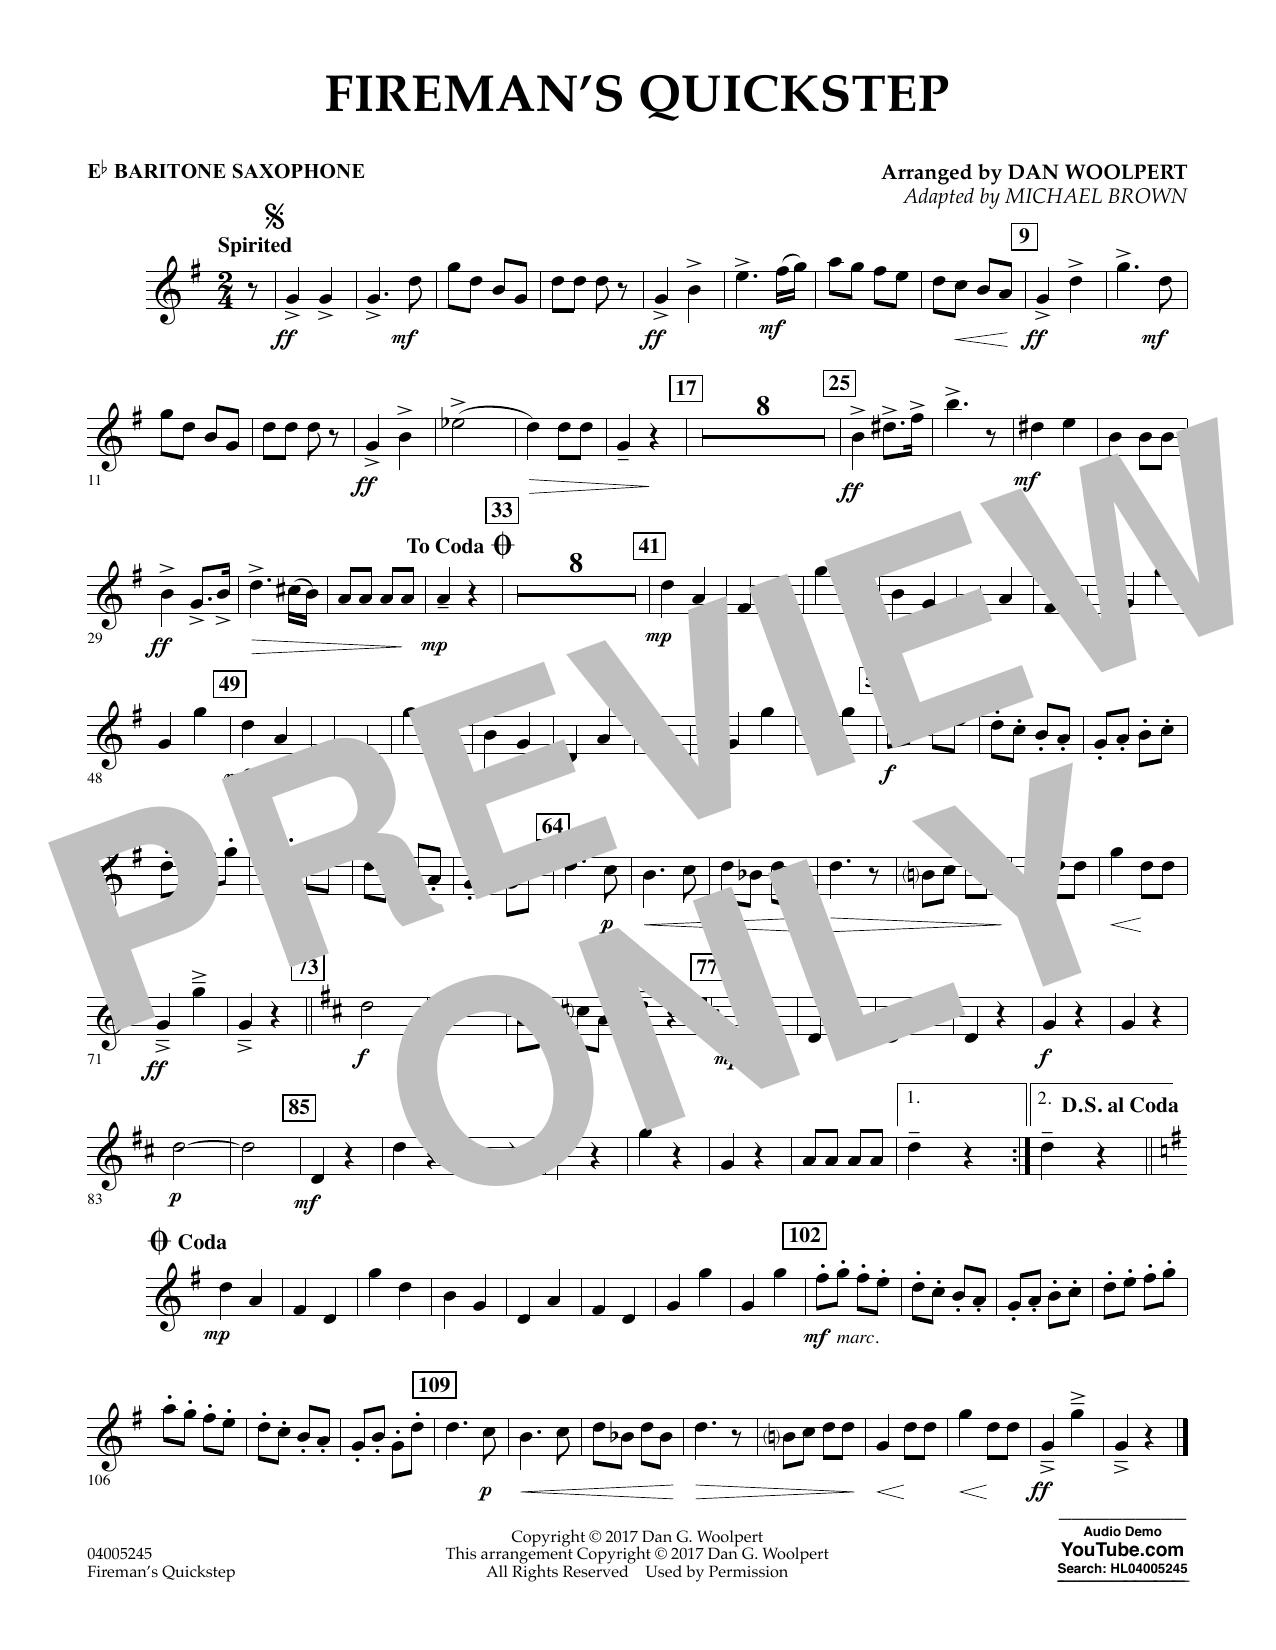 Fireman's Quickstep - Eb Baritone Saxophone (Concert Band)